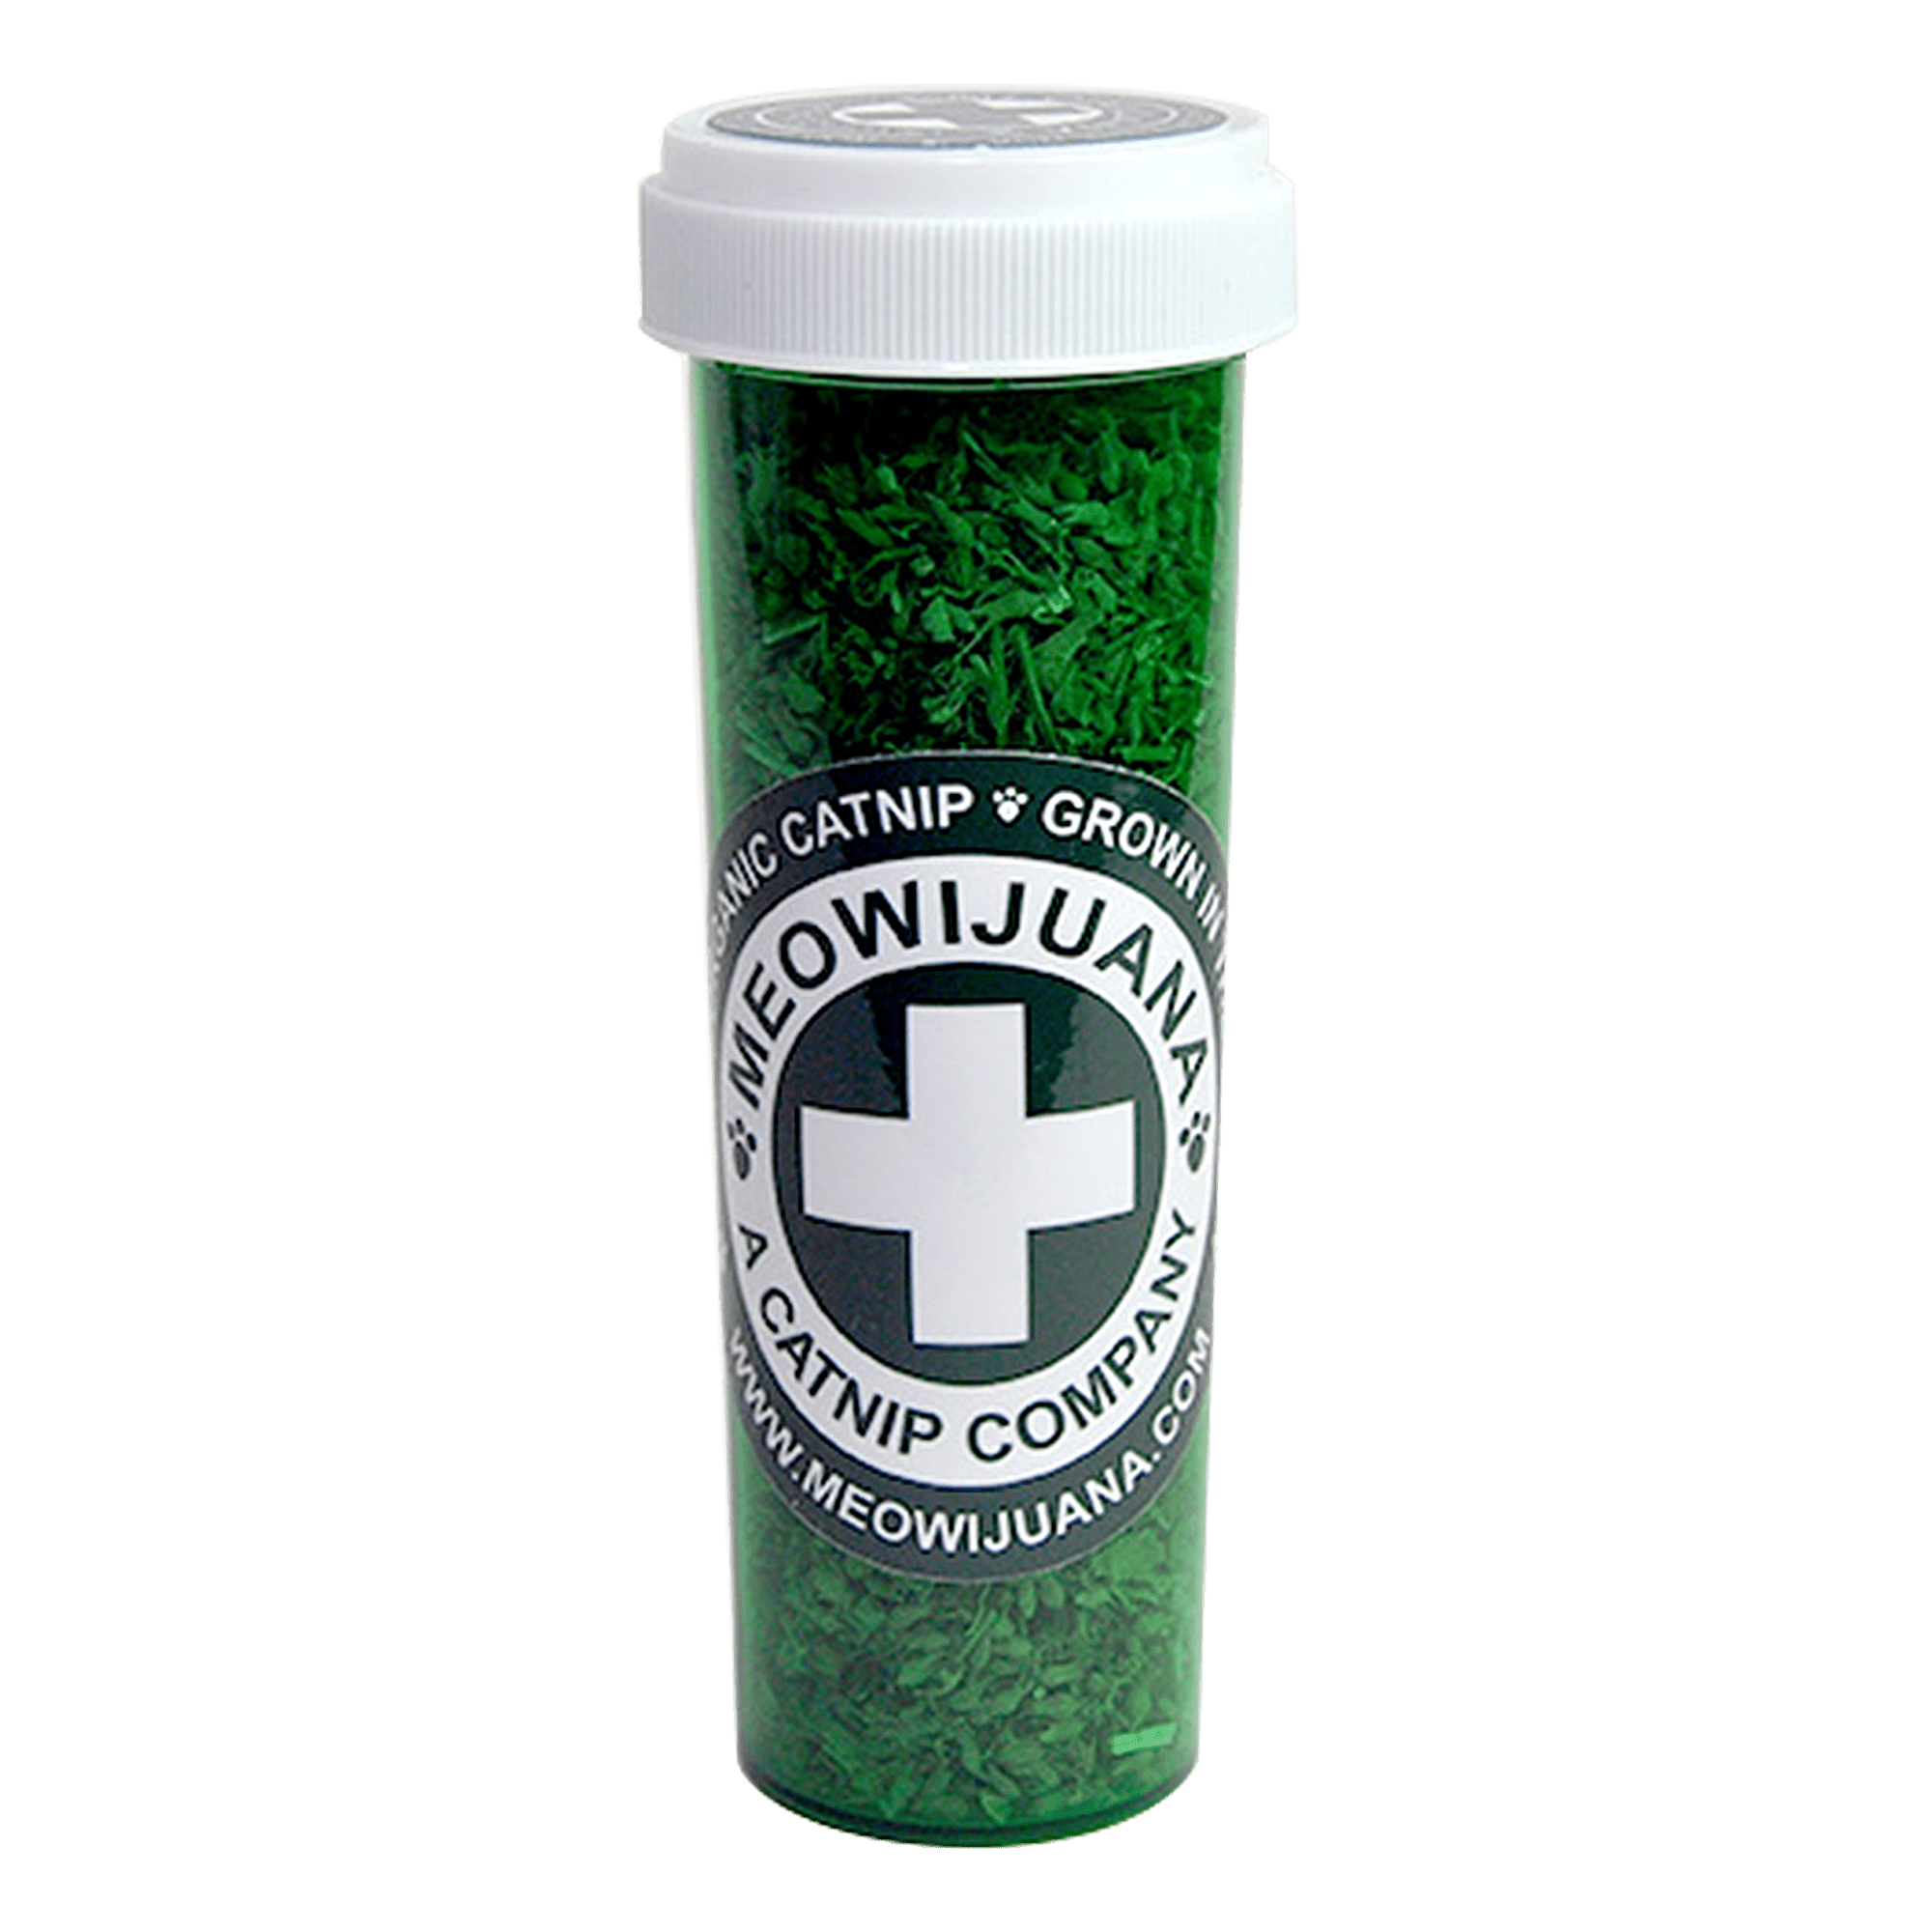 Meowijuana Meowi-Waui Premium Catnip Large Bottle, 18 grams by Meowijuana